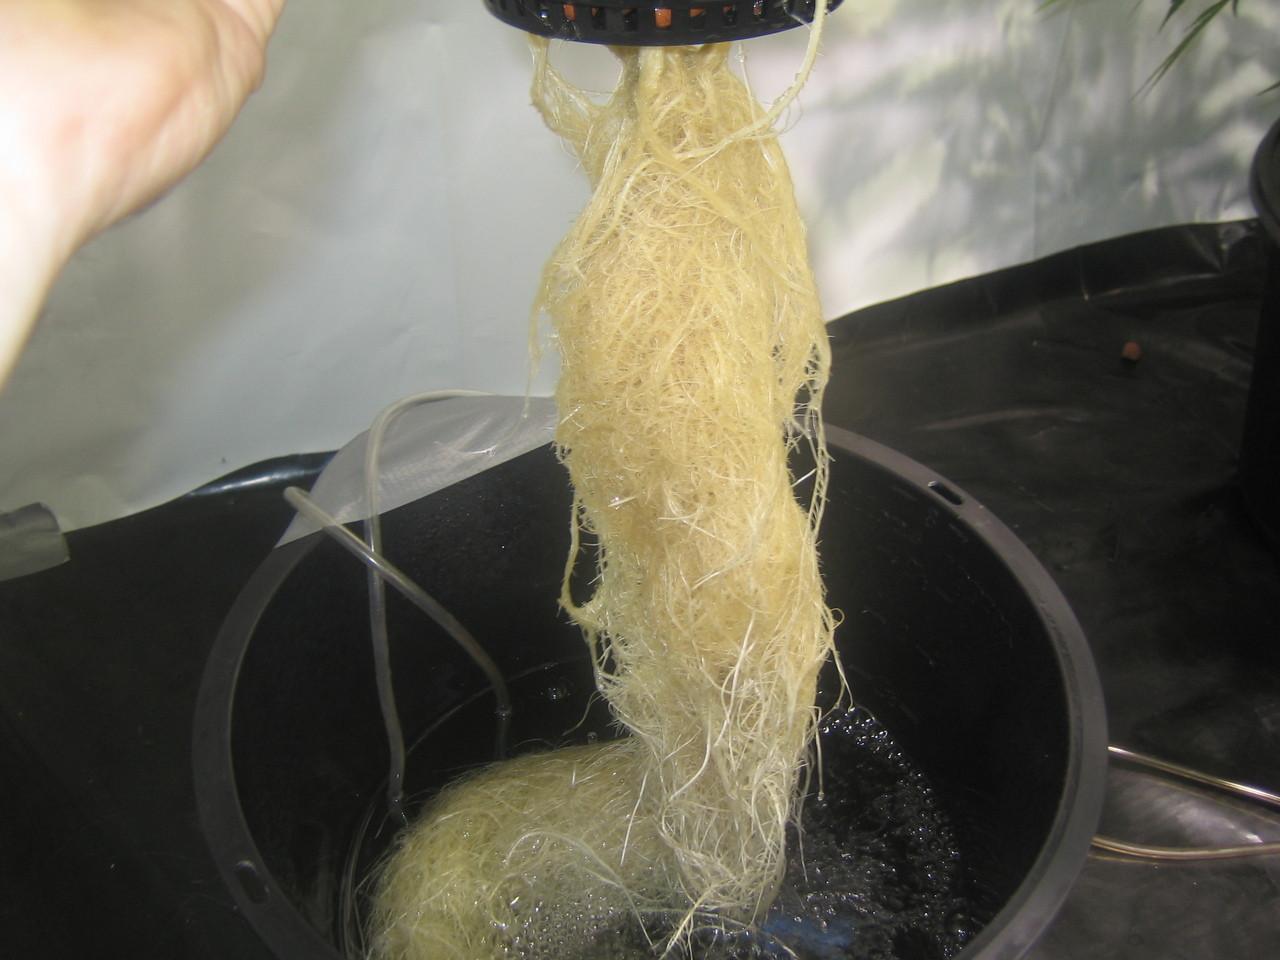 Mycostop Biofungicide WP 5 Gram